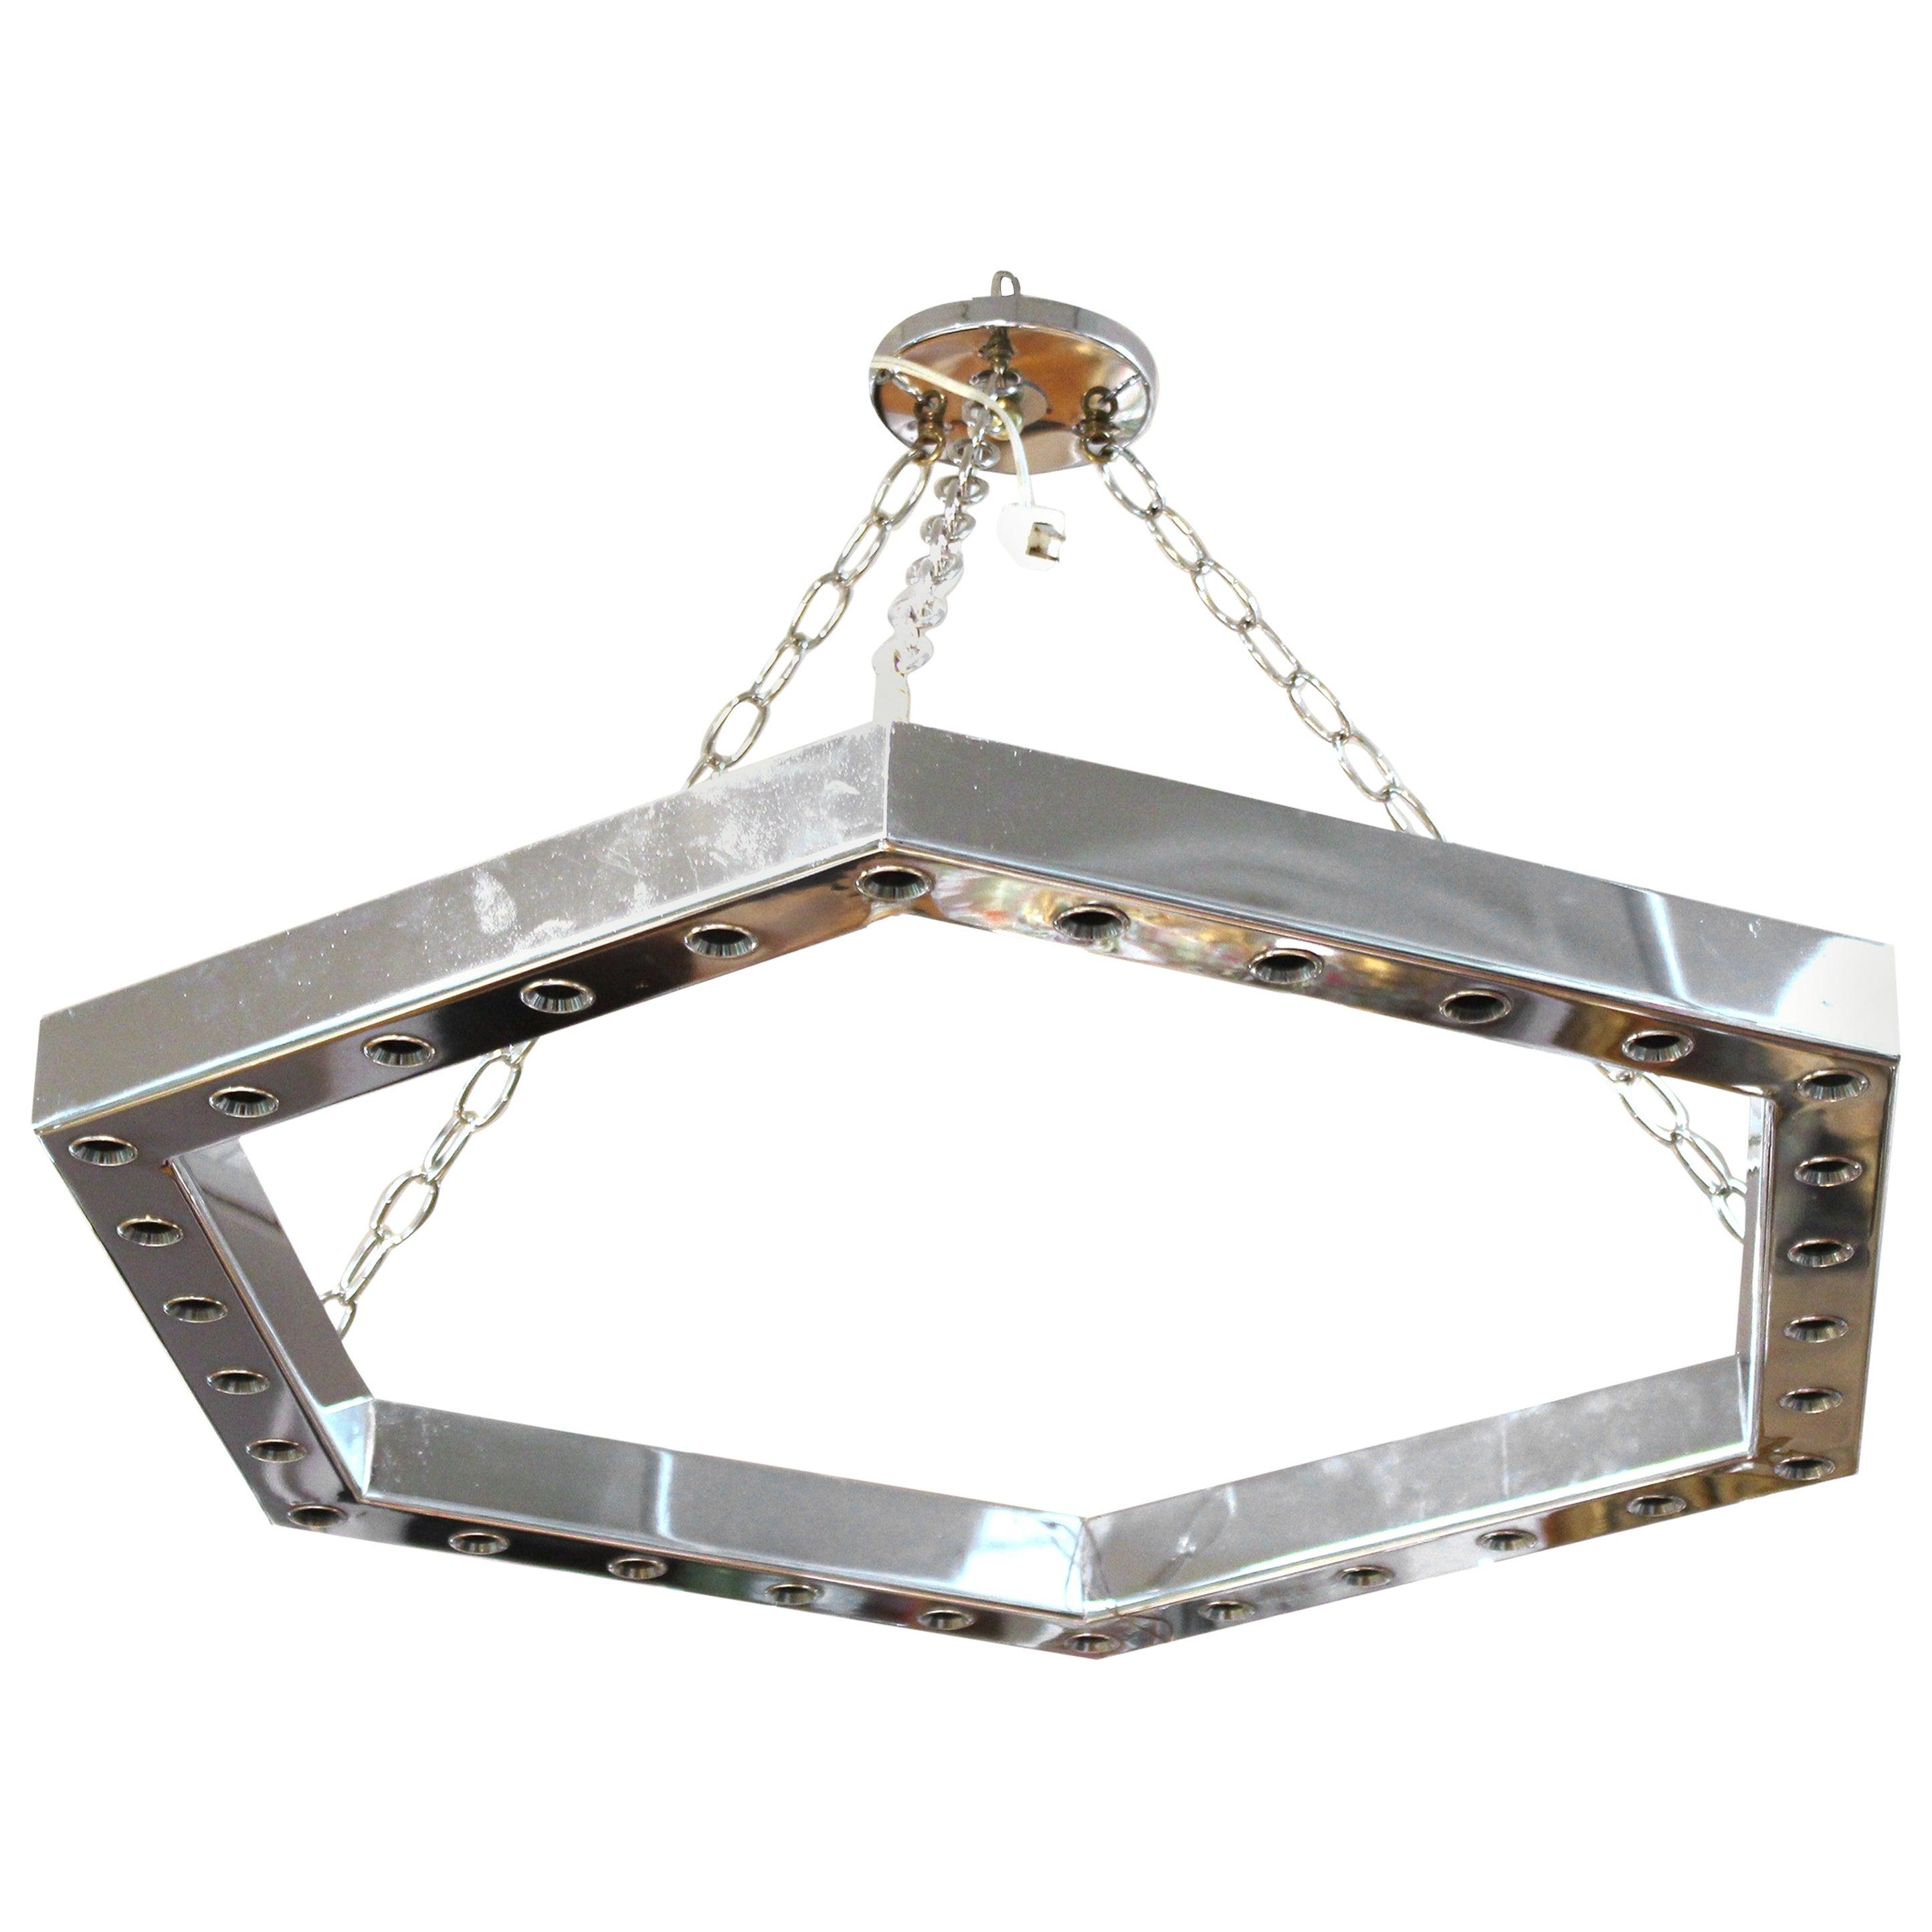 Italian Modern Sciolari Style Hexagonal Pendant Chandelier